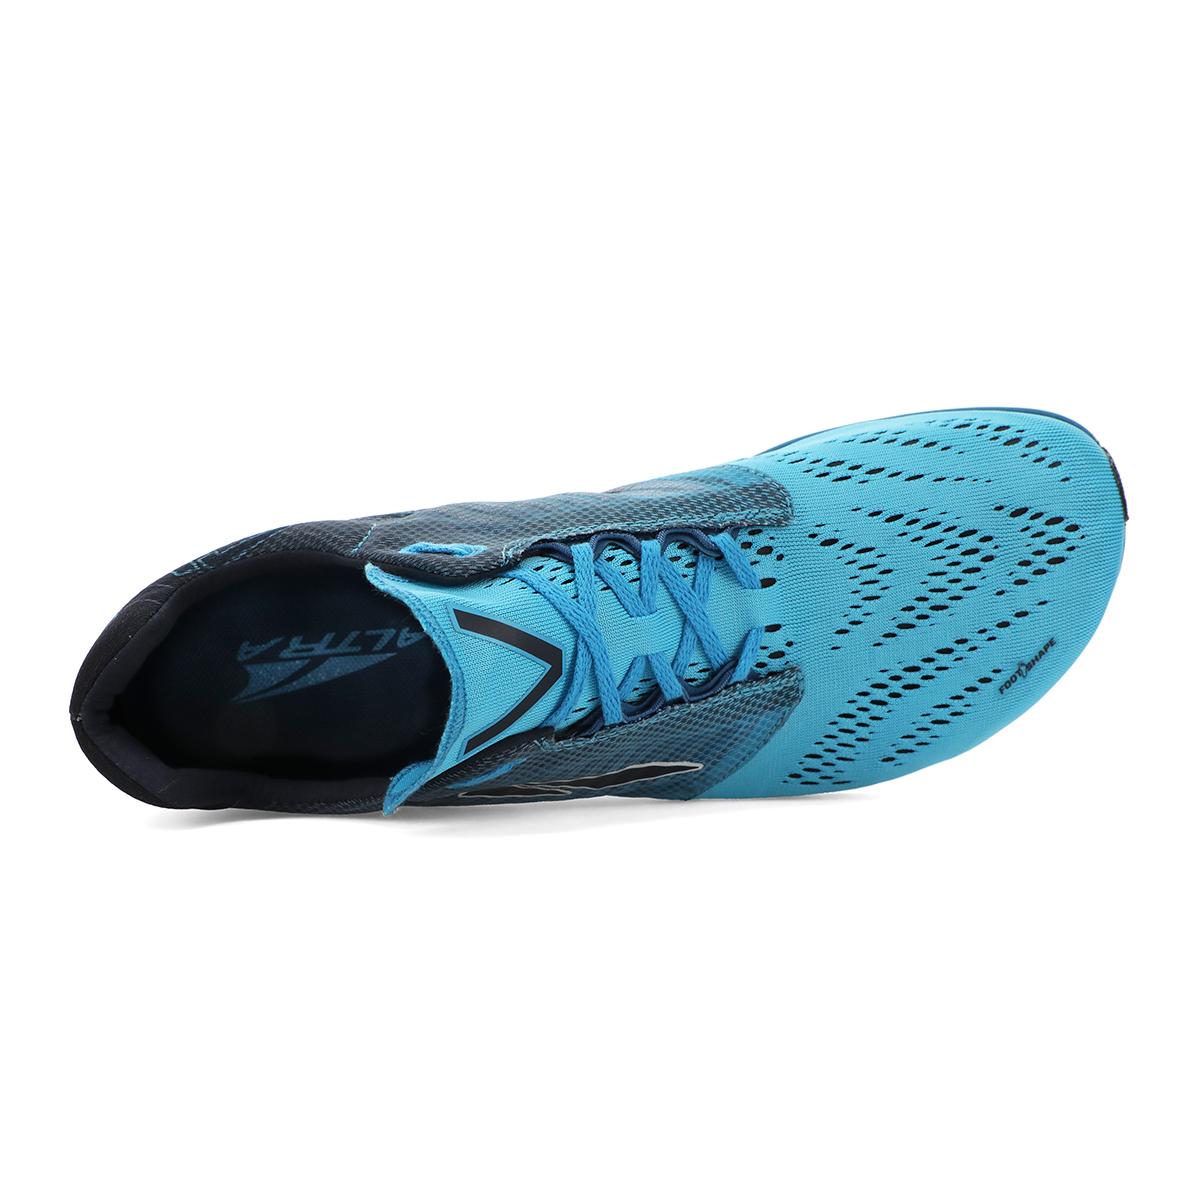 Altra Vanish R Running Shoe - Color: Electric Blue - Size: M4/W5.5 - Width: Regular, Electric Blue, large, image 3